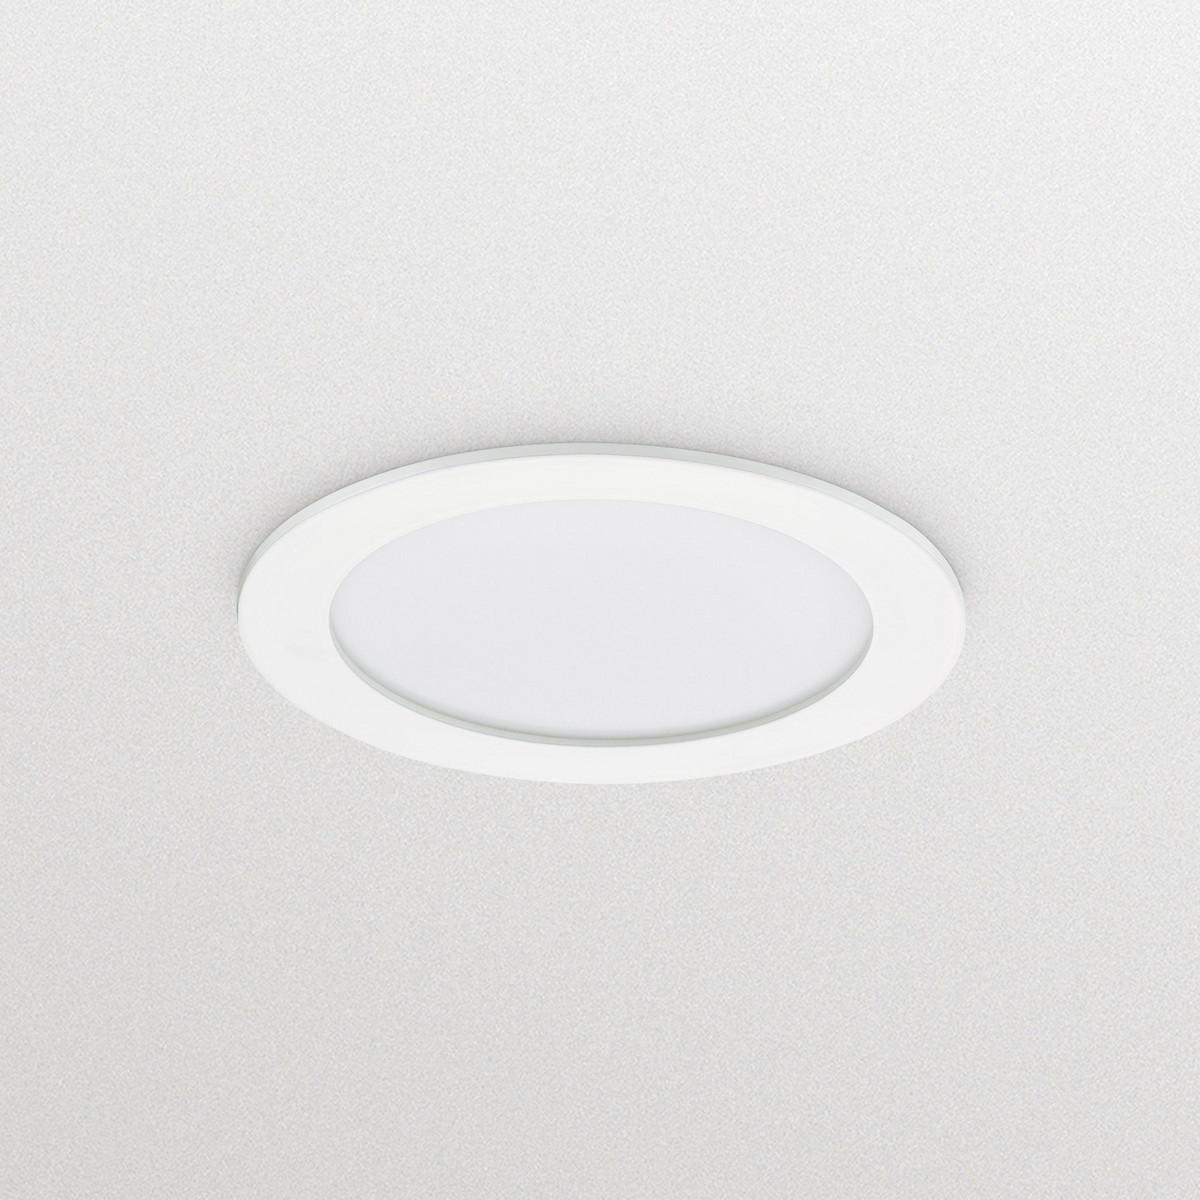 Philips CoreLine SlimDownlight Gen3 Indbyg DN145B 1100lm/840 11W Hvid